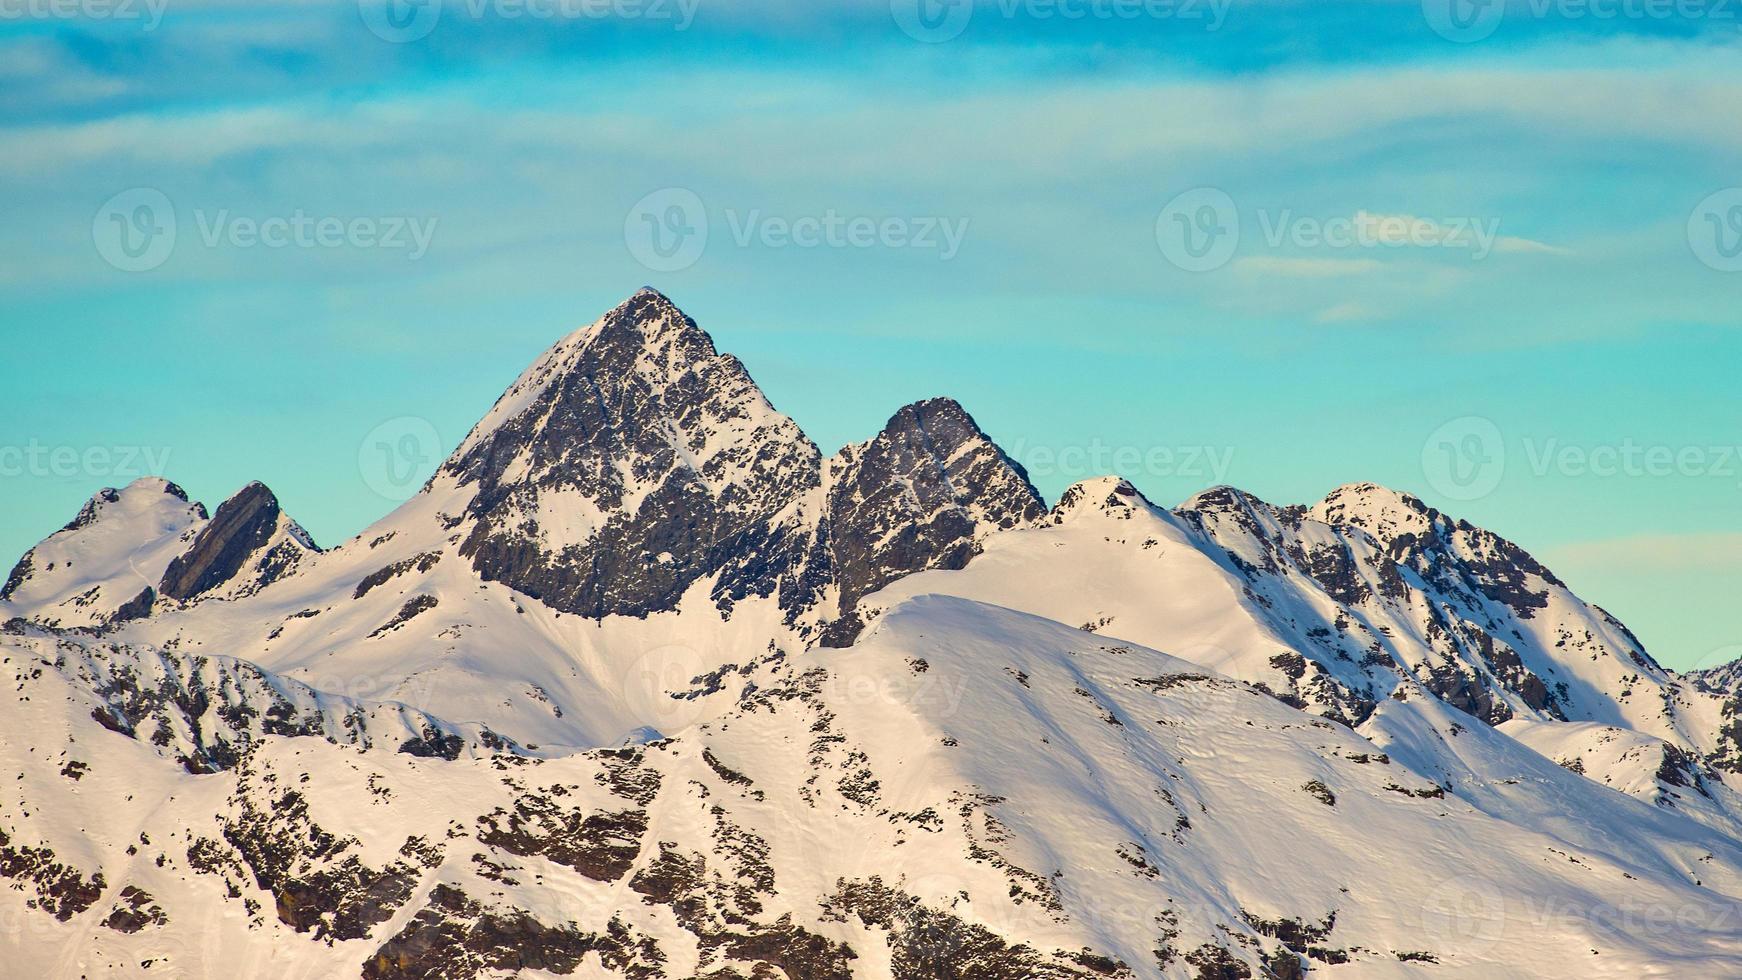 la montagne de dentelle diavolo dans la haute vallée de la brembana. où la rivière Brembo prend sa source photo